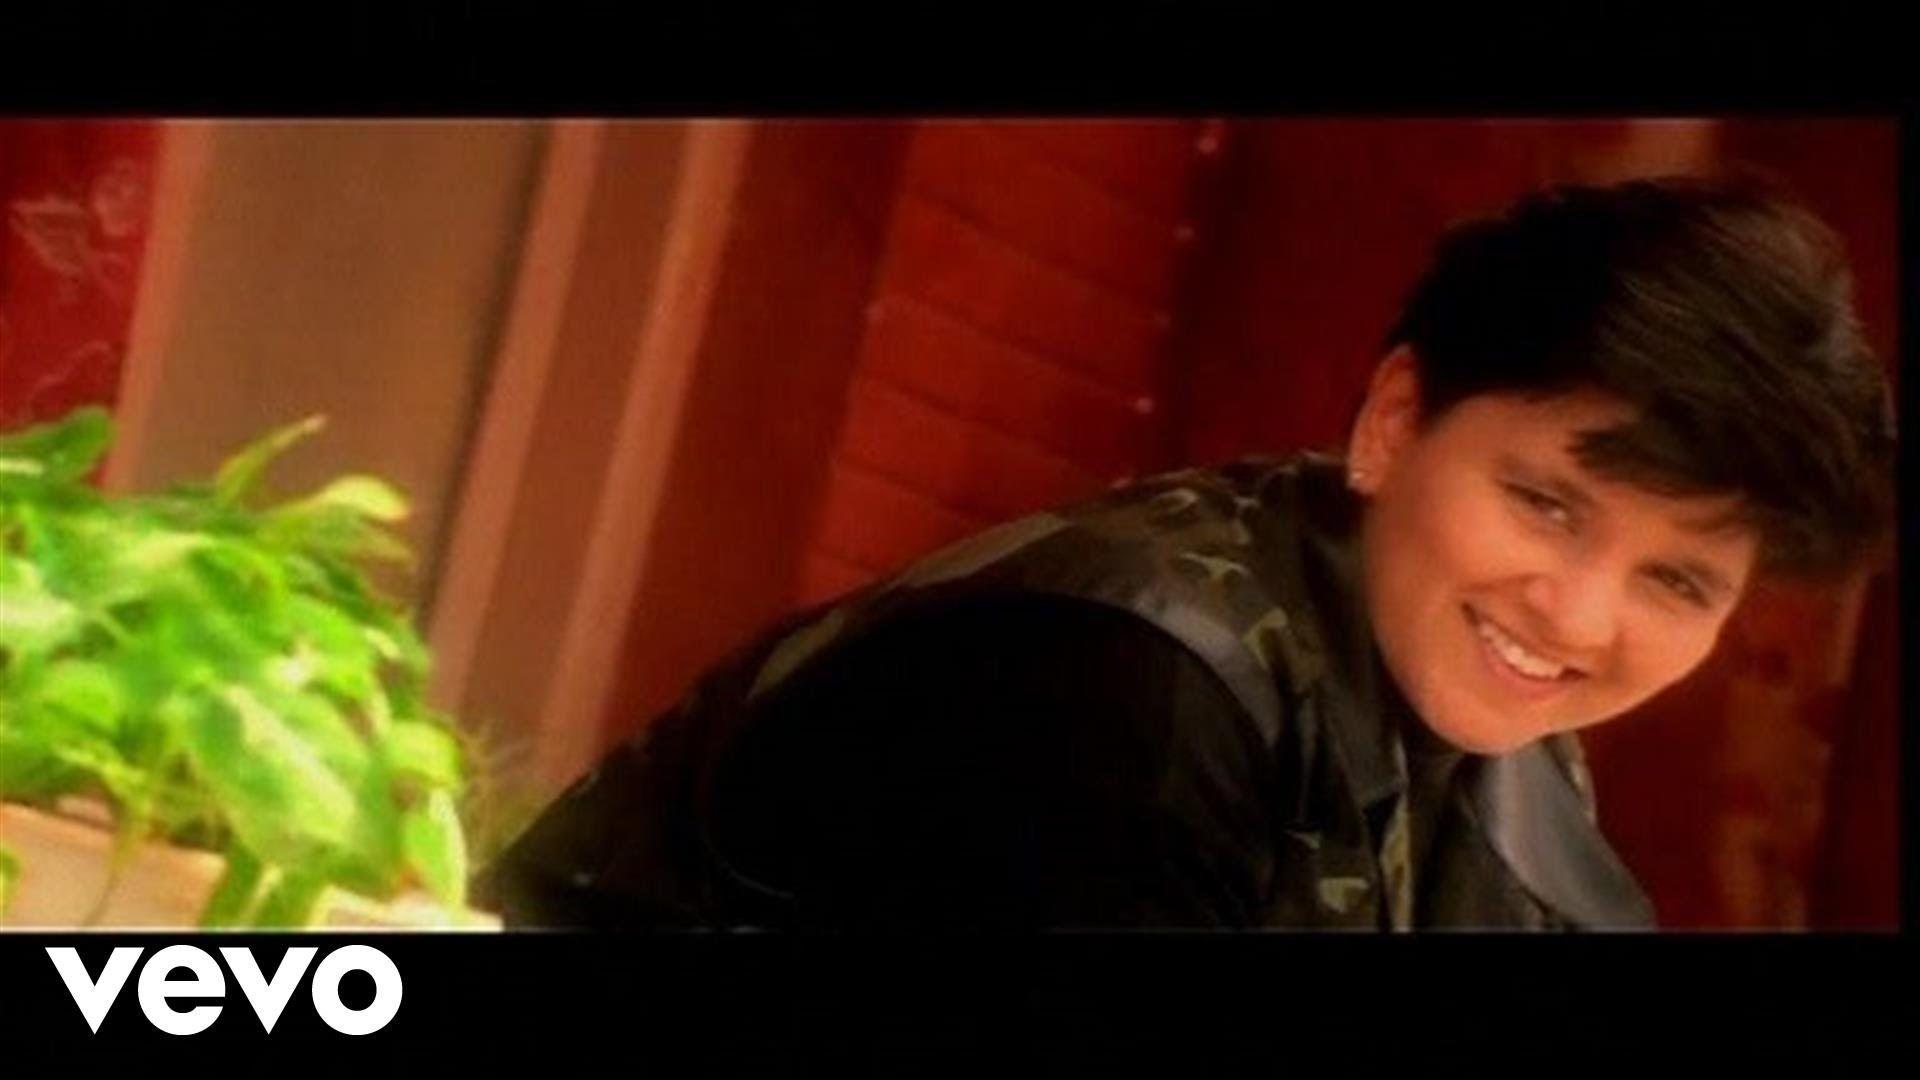 Iqbal Sneha In Indhana Winva Gayi Thi More Saiyaan Songs Music Videos Youtube